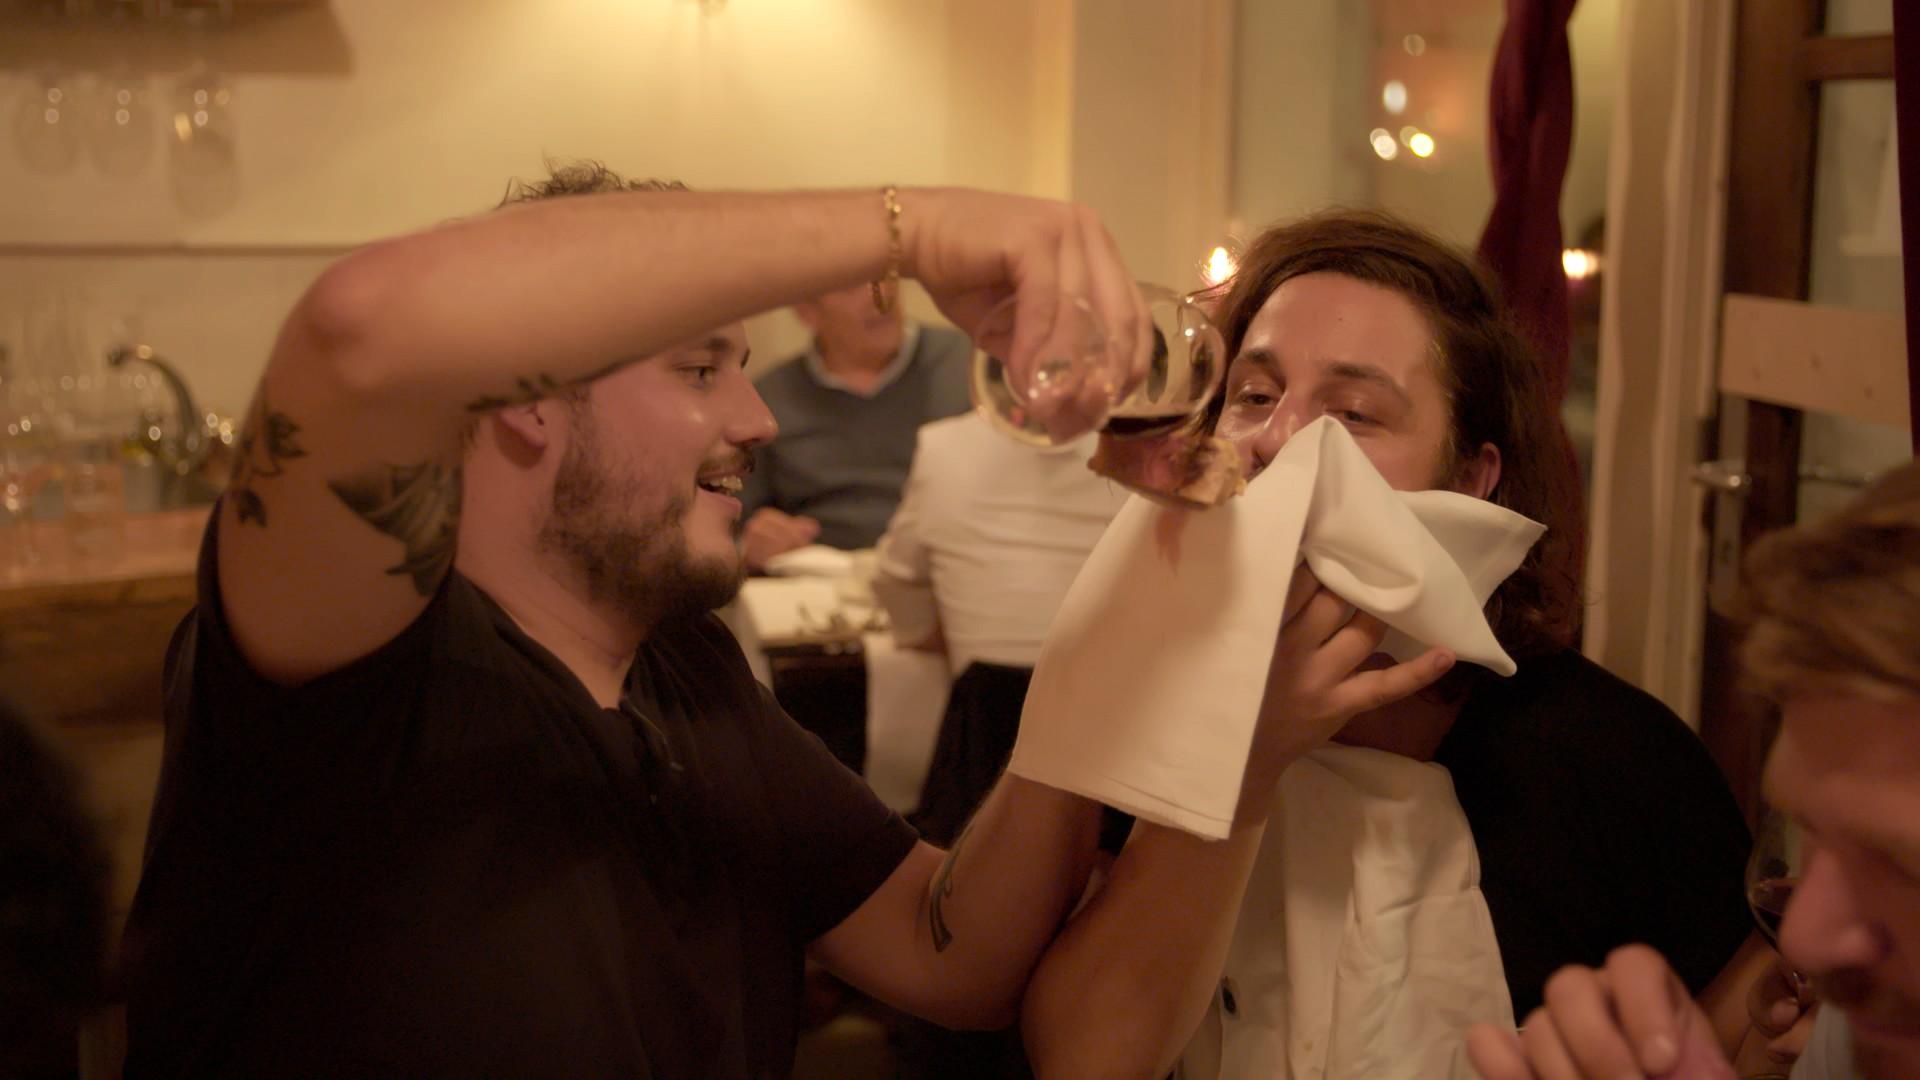 Chef's Night Out: Benny Blisto van BAK Restaurant in Amsterdam